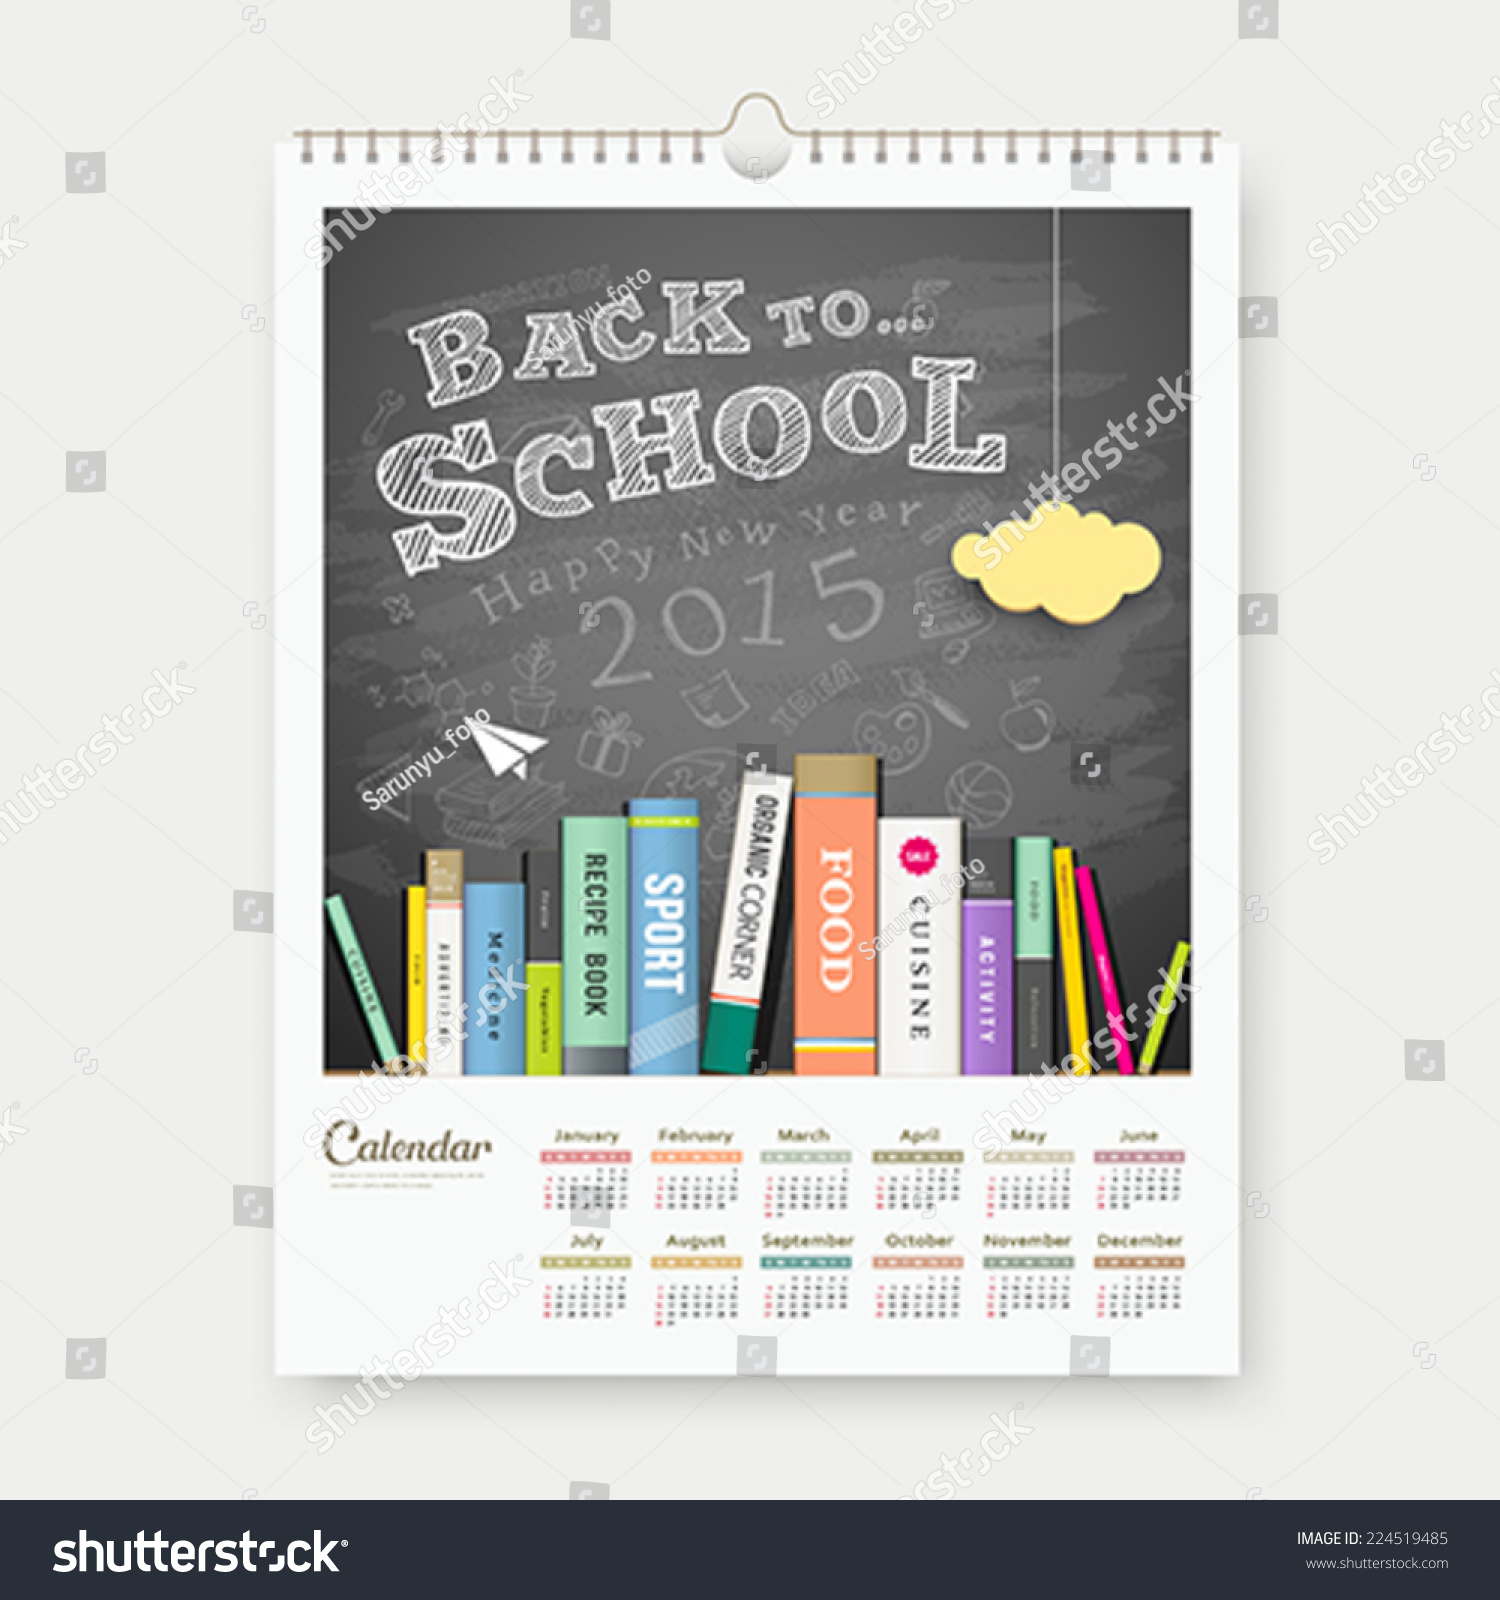 Calendar Design Concept : Calendar back to school with books concept design